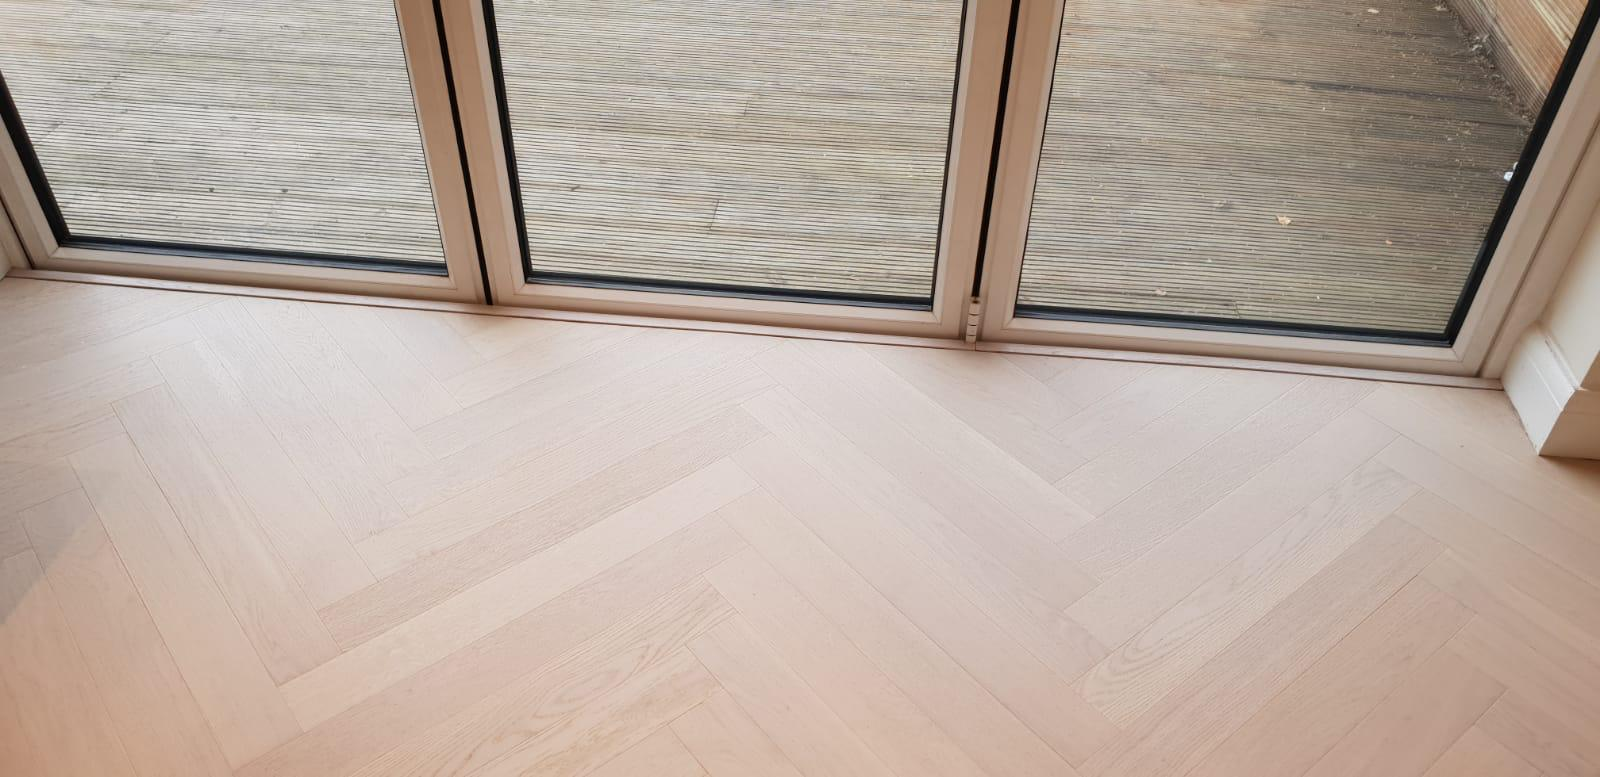 Prime Engineered Flooring Oak Herringbone Double White